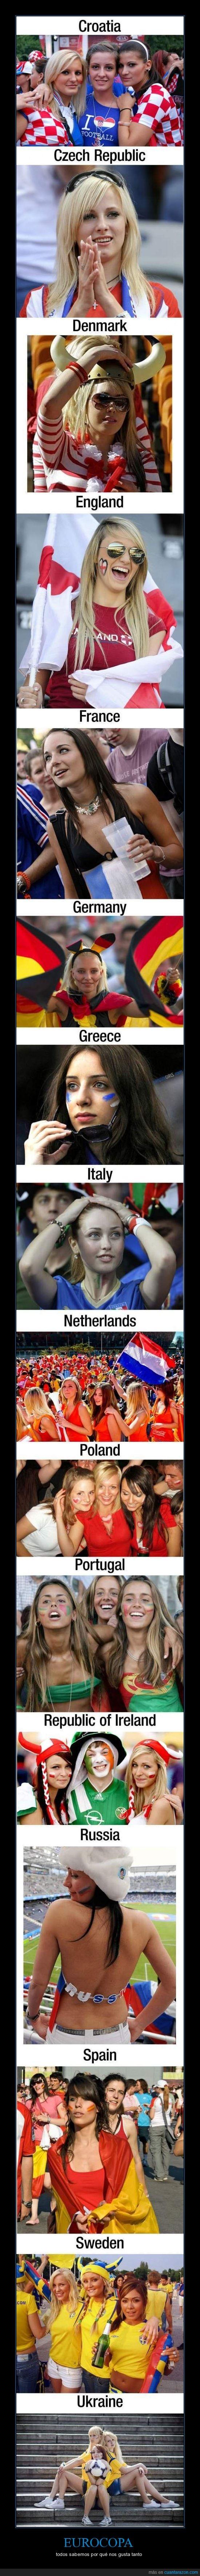 buenas,chica,eurocopa,guapa,pais,seleciones,tias